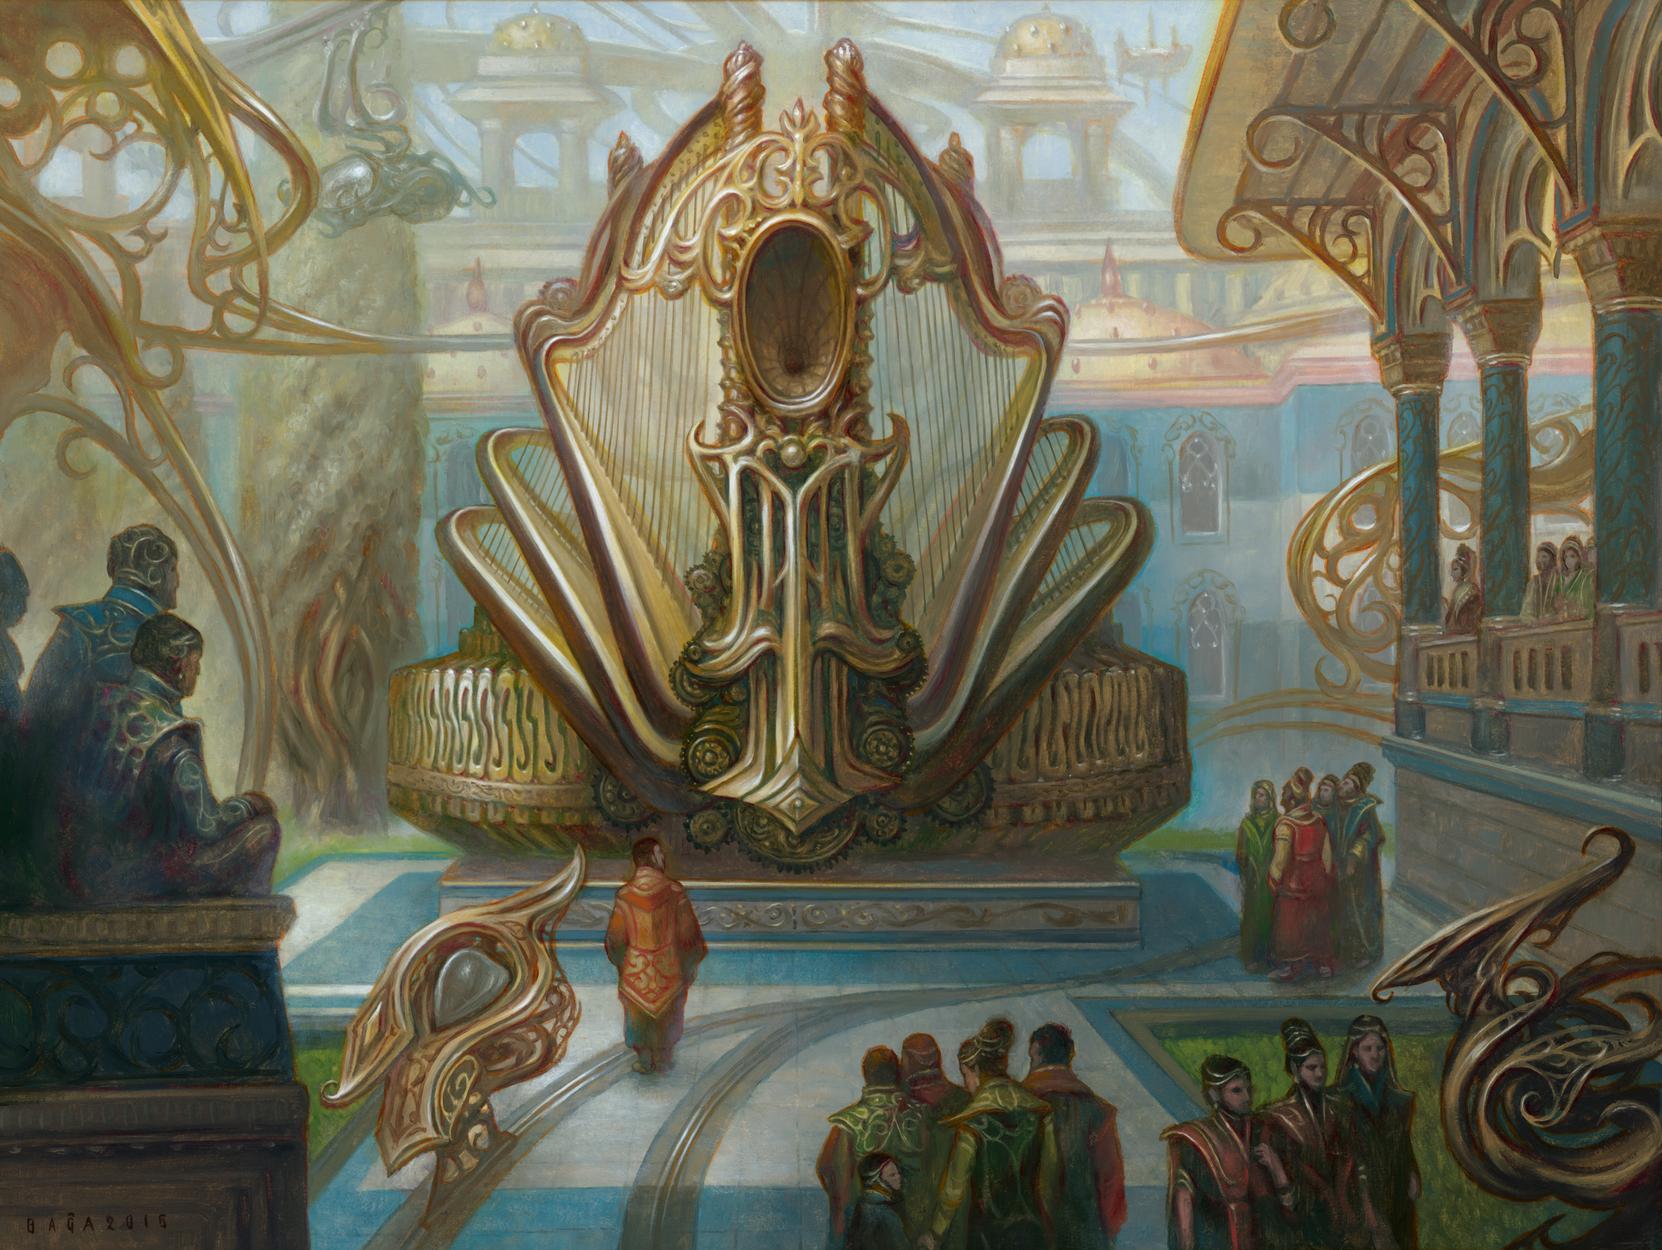 Panharmonicon Artwork by Volkan Baga